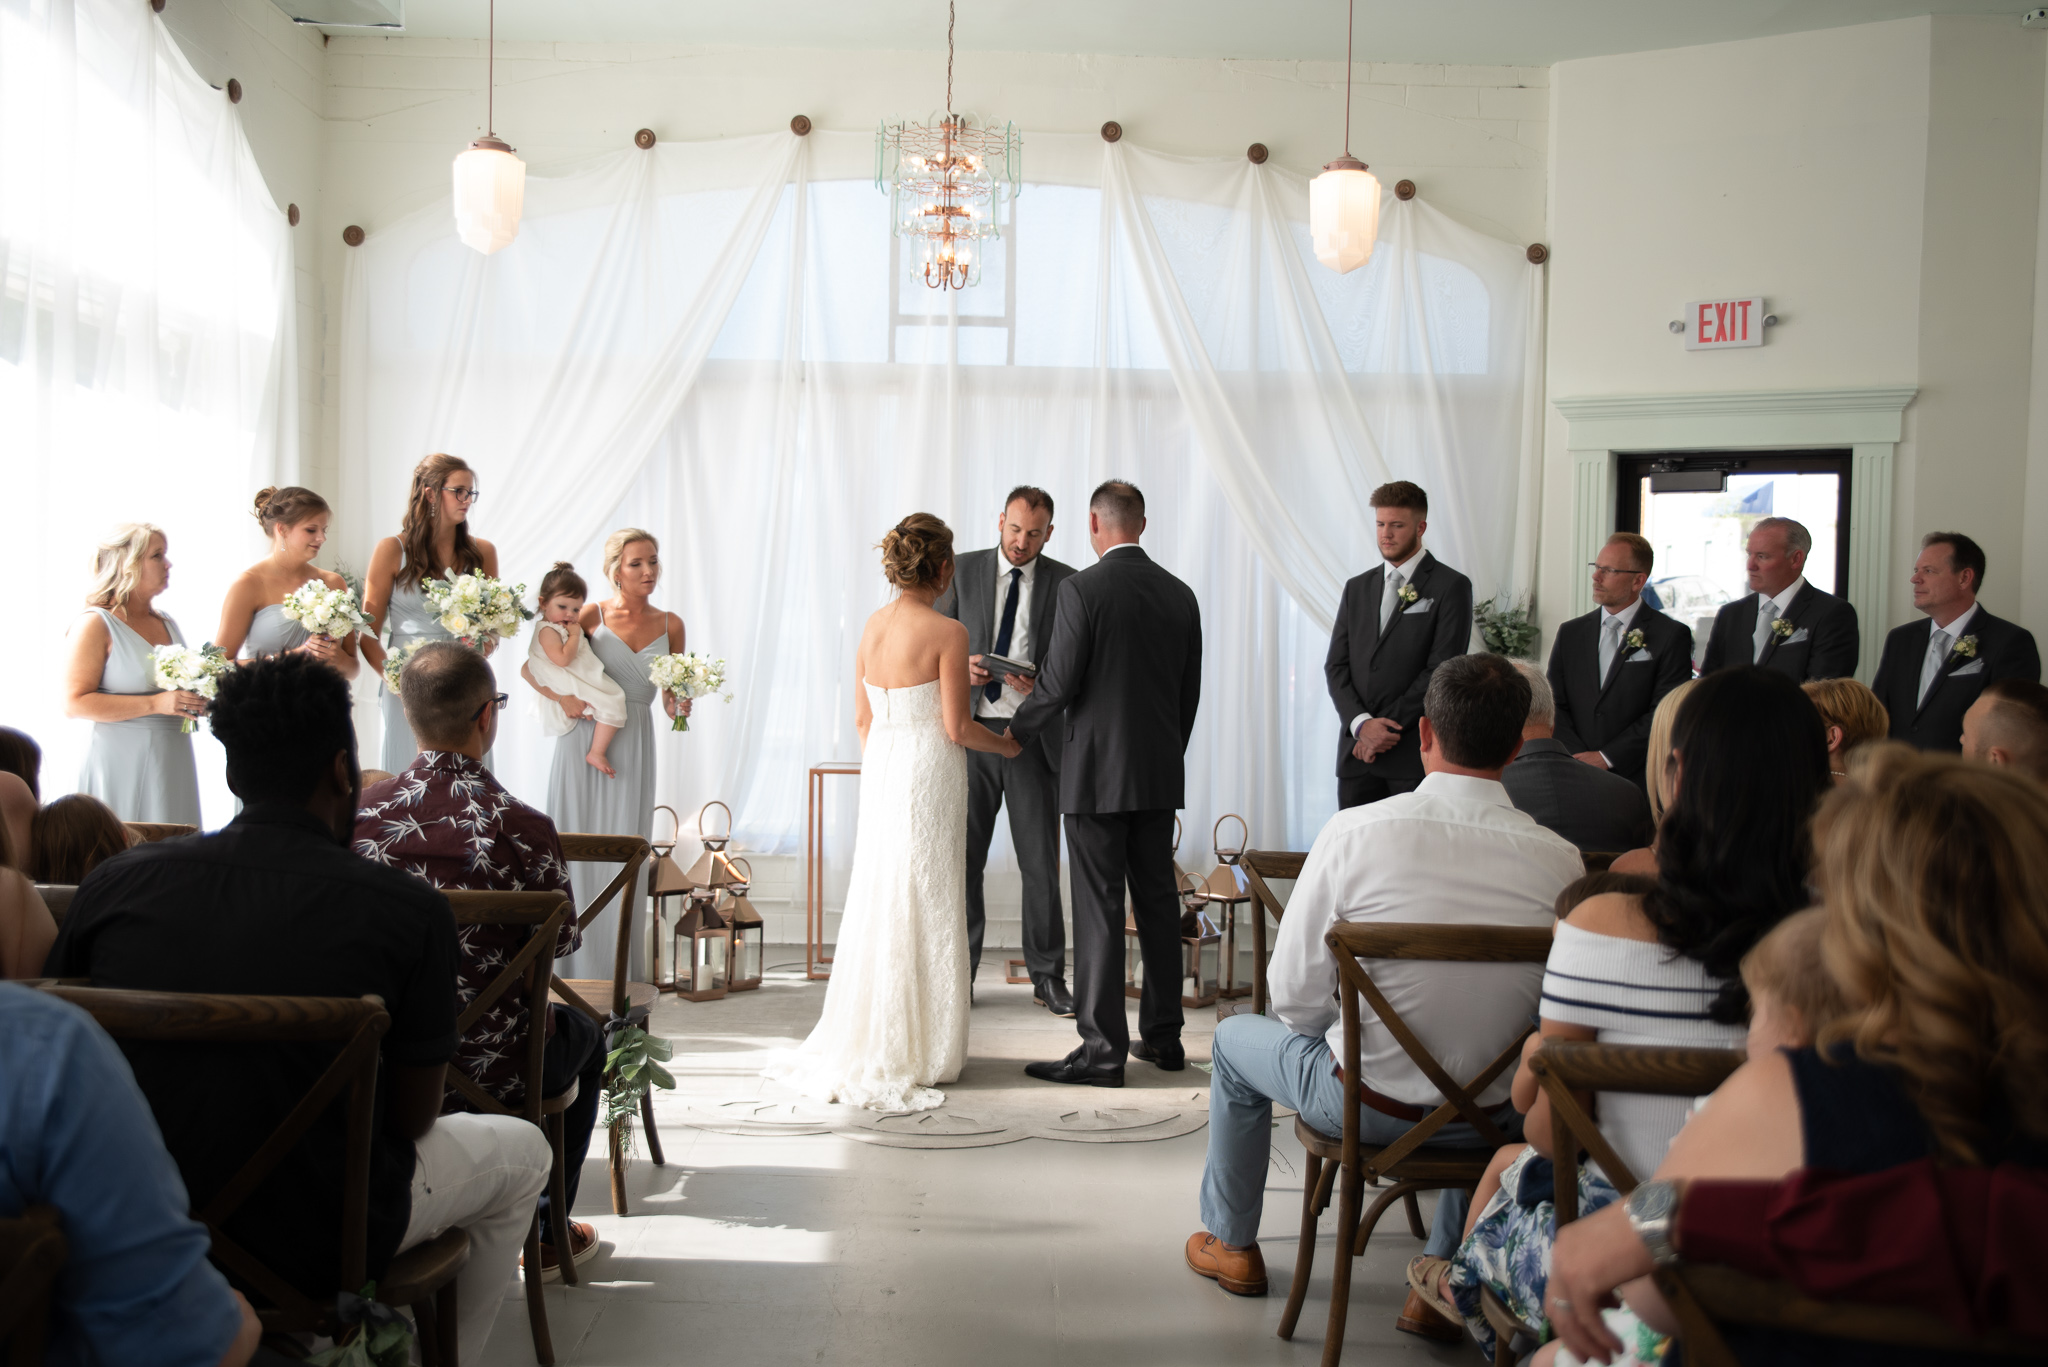 Real_Wedding_Small_Venue_Kansas_City_Chapel_on_the_Corner_DSC_5227-2.jpg